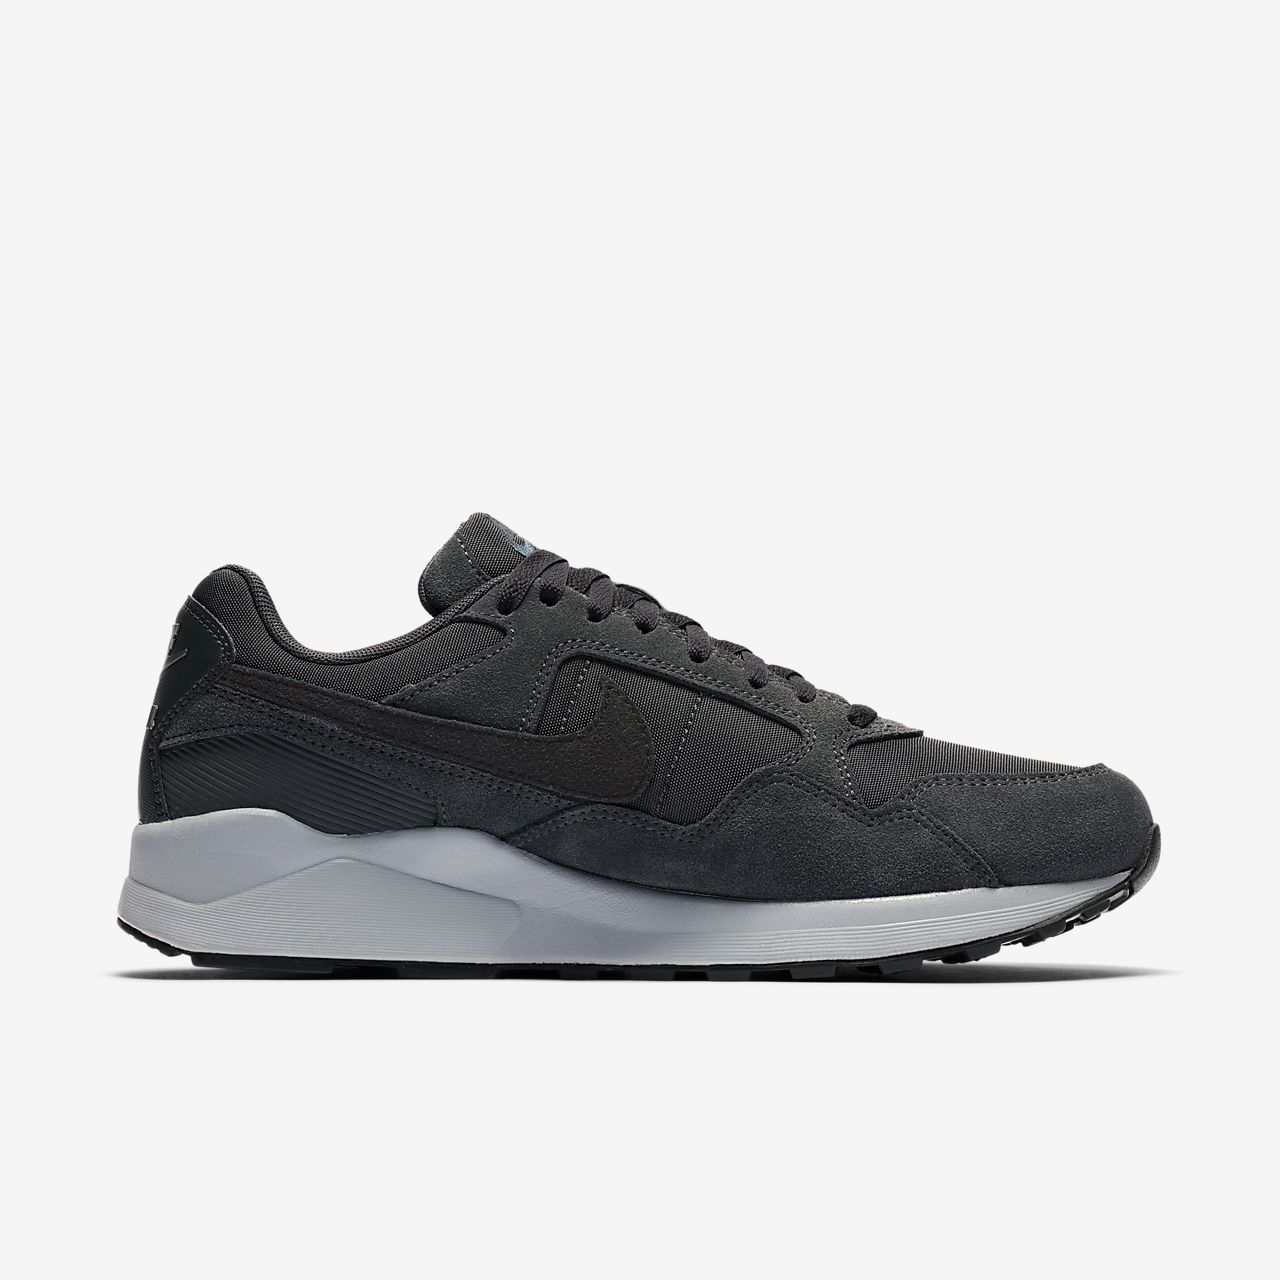 Chaussure Nike Air Pegasus 92 Lite SE pour Homme